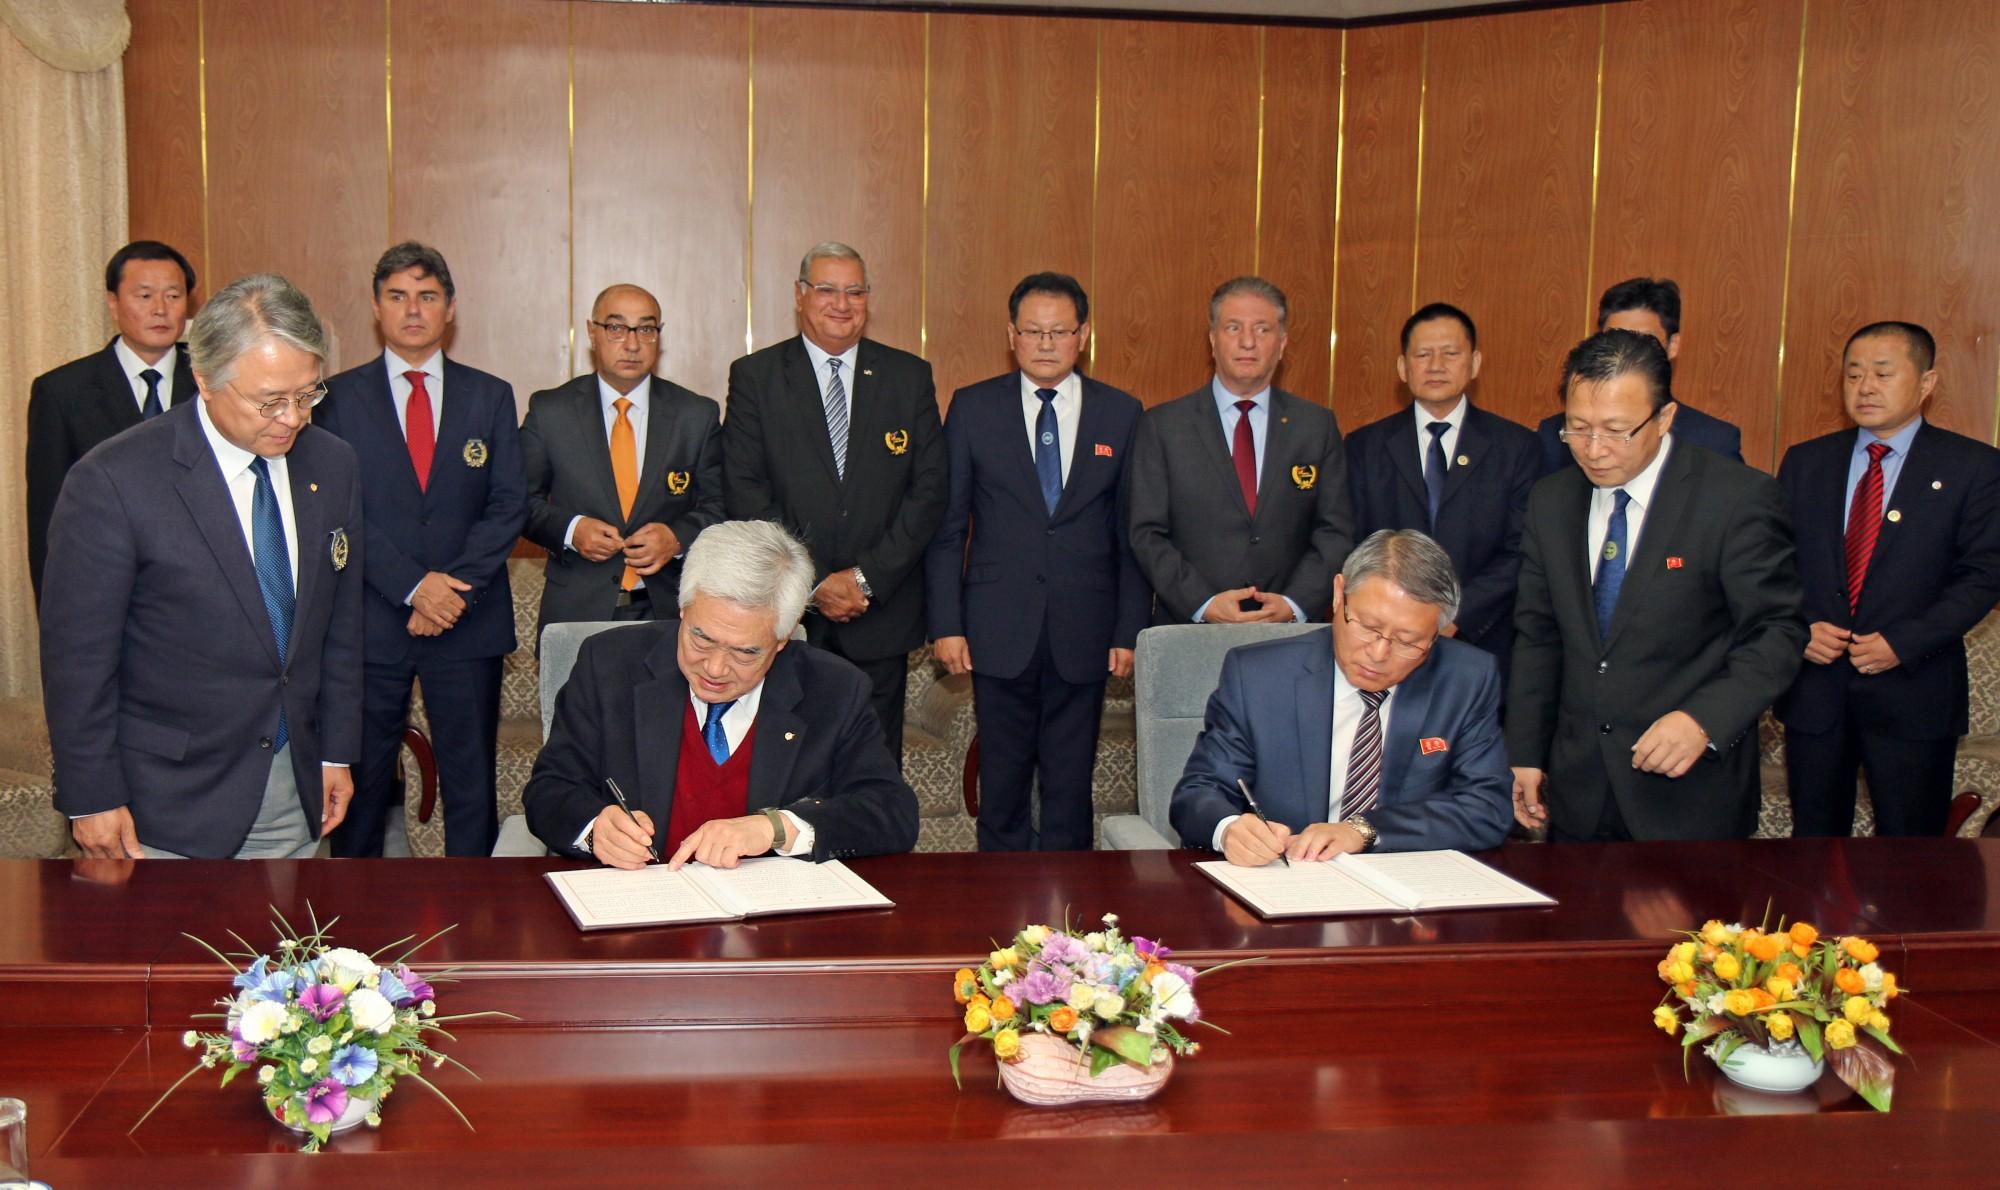 WT President Chungwon Choue (left) and ITF President Ri Yong Son (right) signing WT-ITF agreement at Pyongyang Yanggakdo Internationl Hotel on Nov. 2 2018